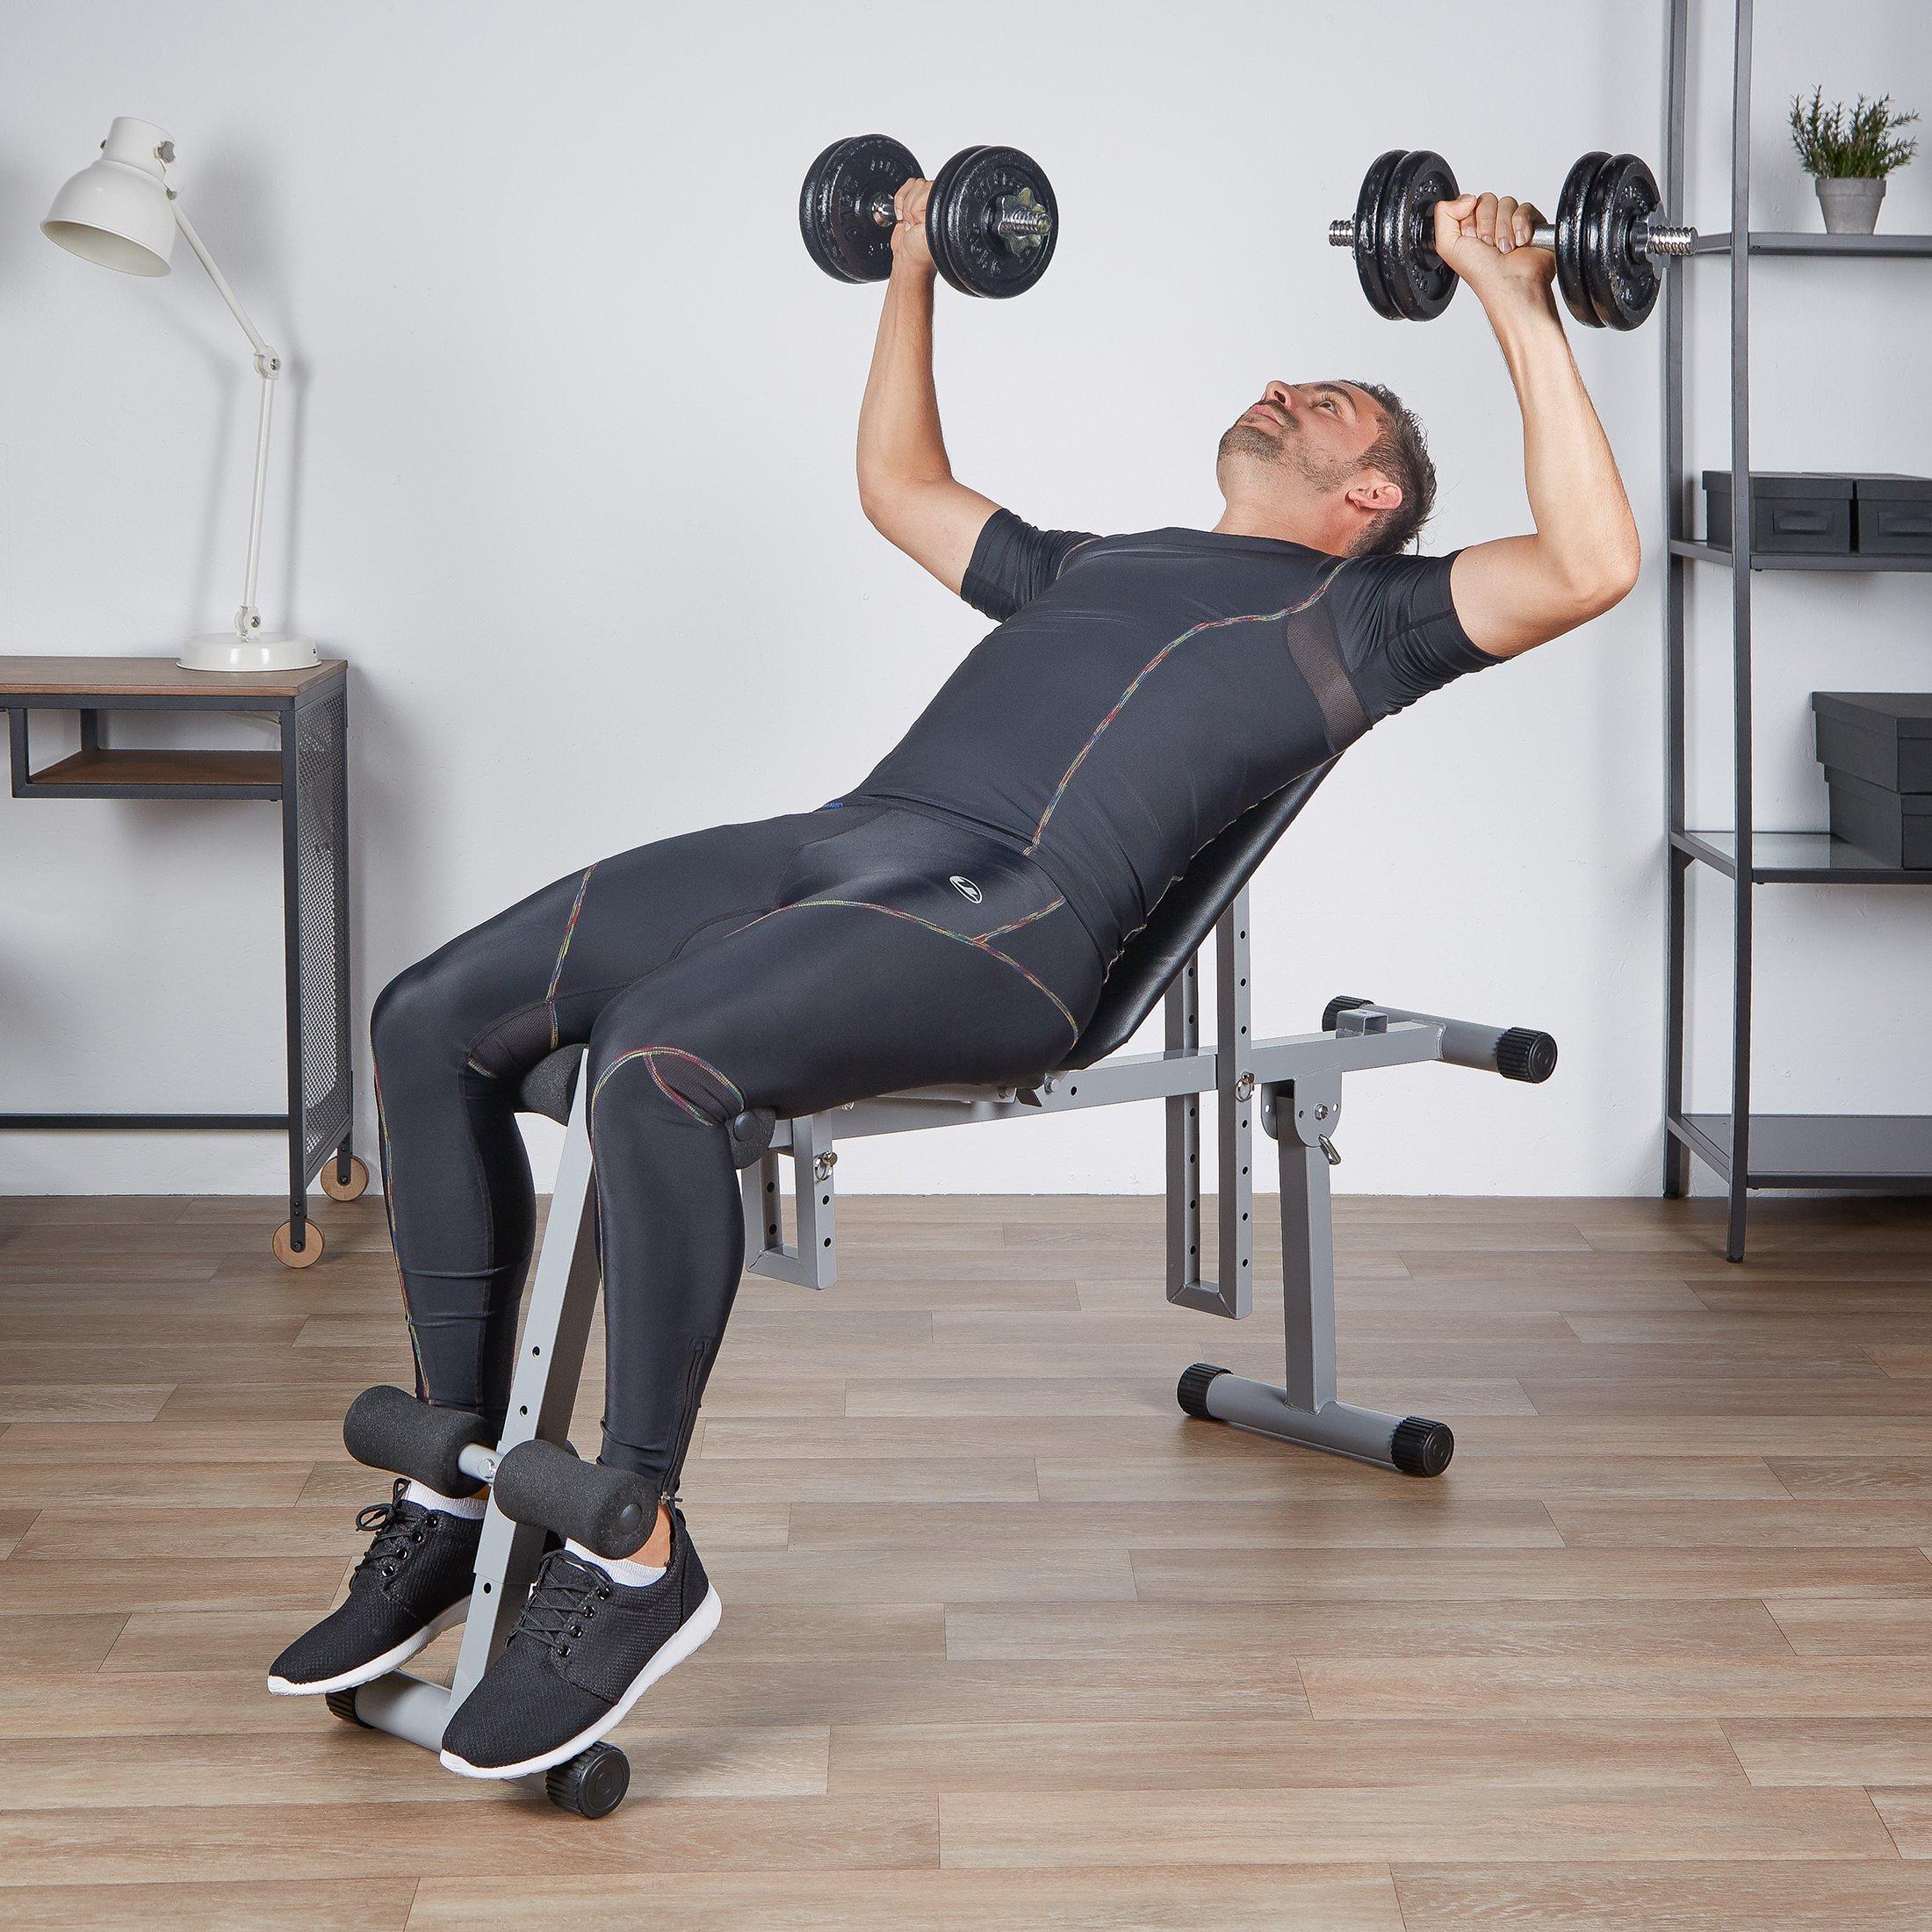 Ultrasport Banc De Musculation All In One Banc Dentraînement